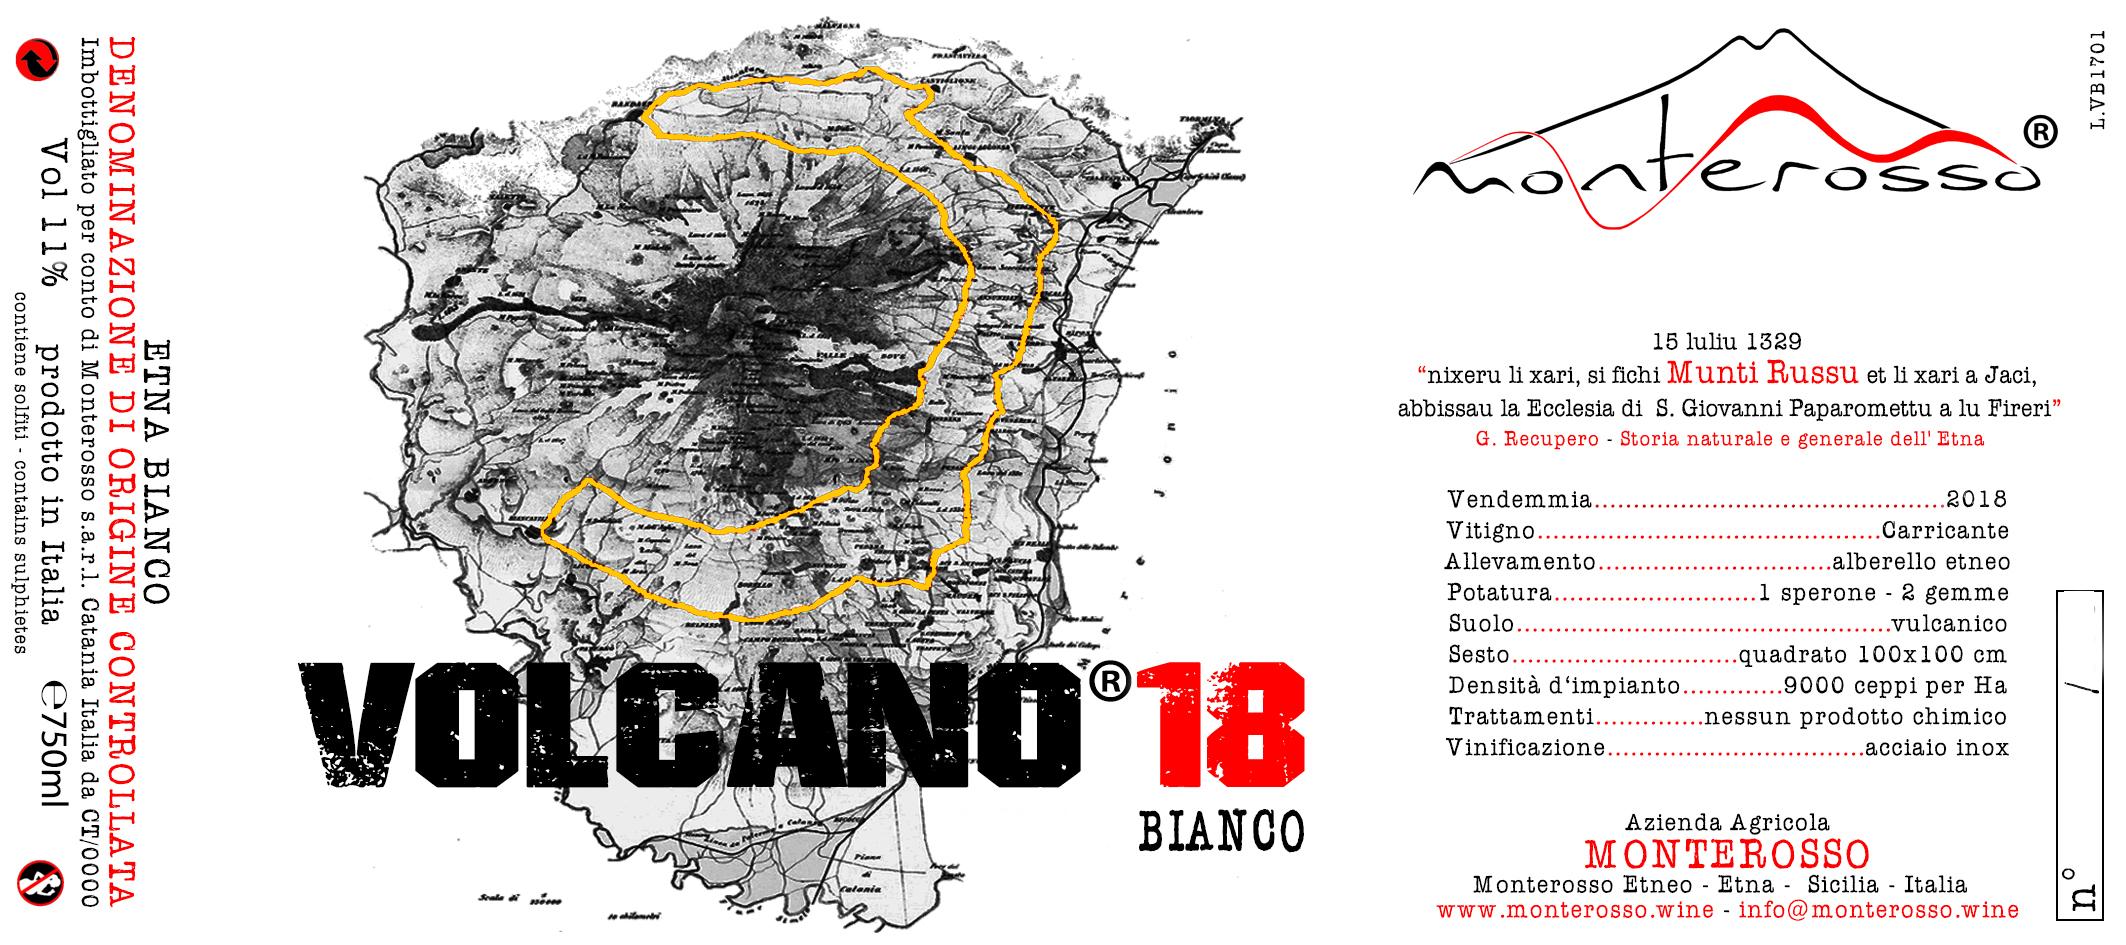 Volcano Bianco 18